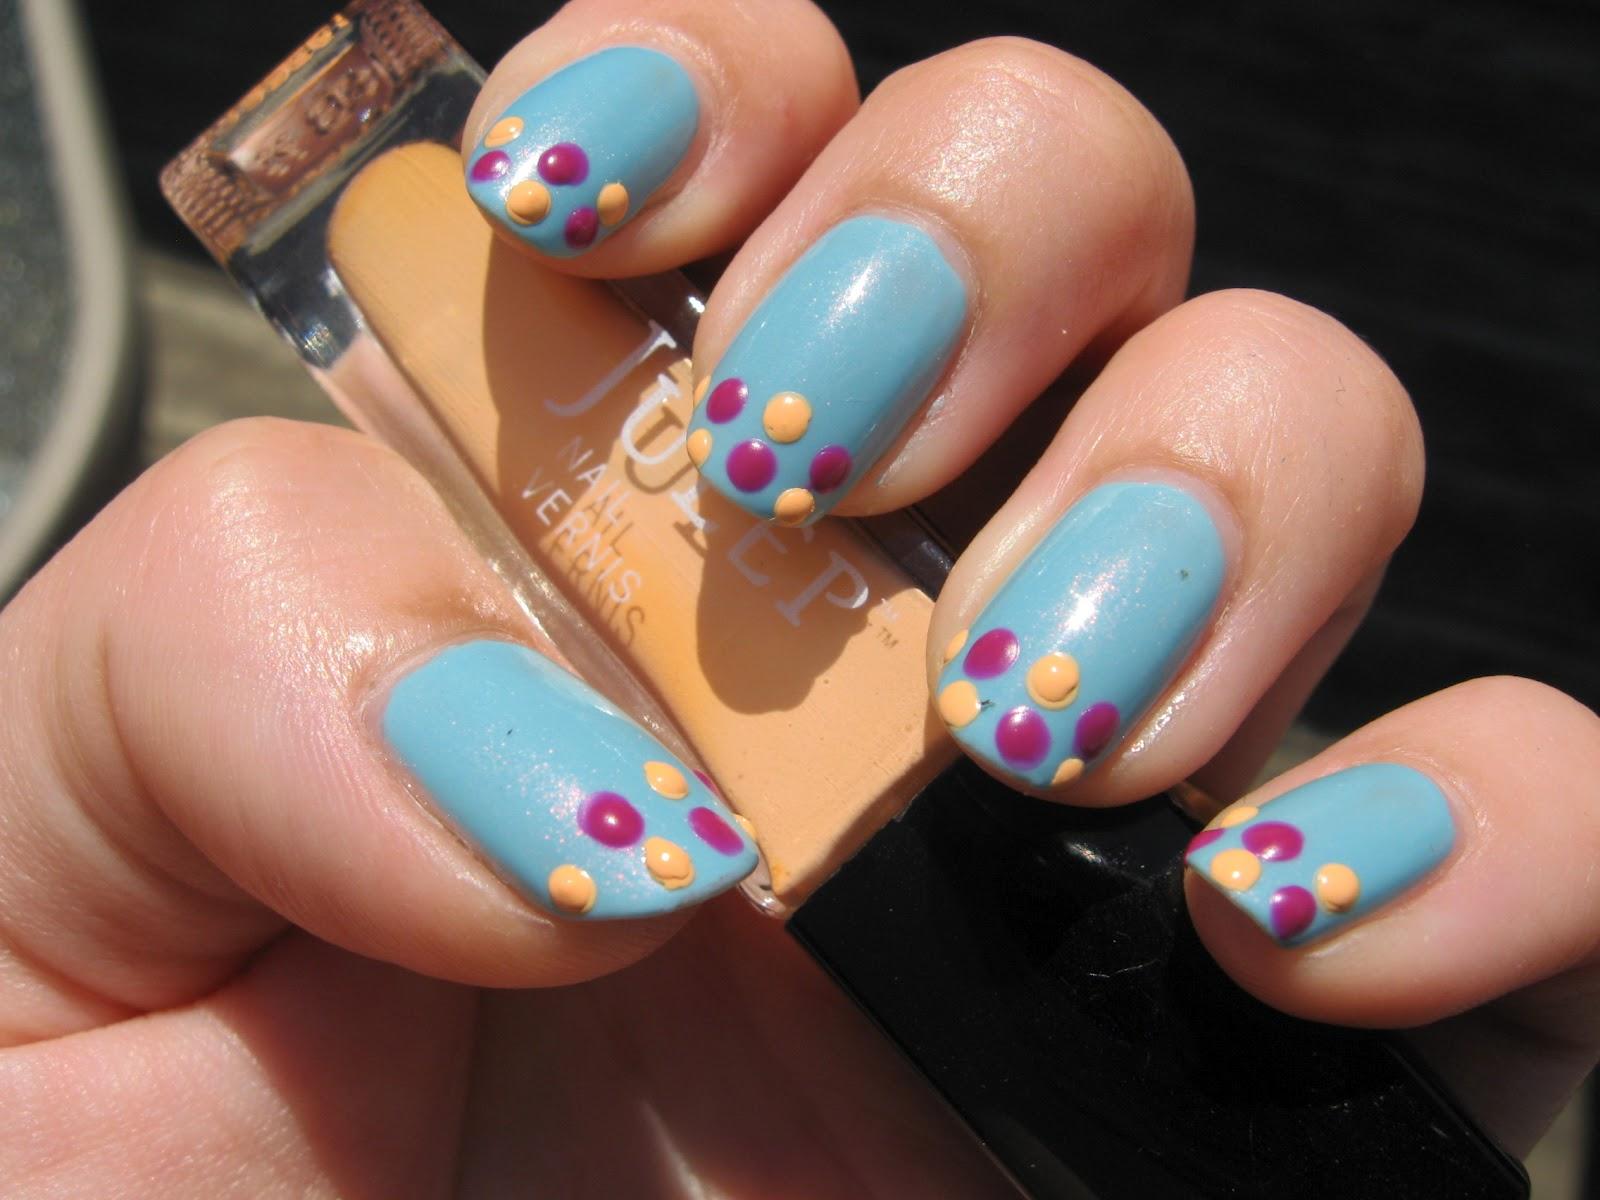 NOTDPolkaDotFrenchTipNailArt2 - Beautifull nail colours :)